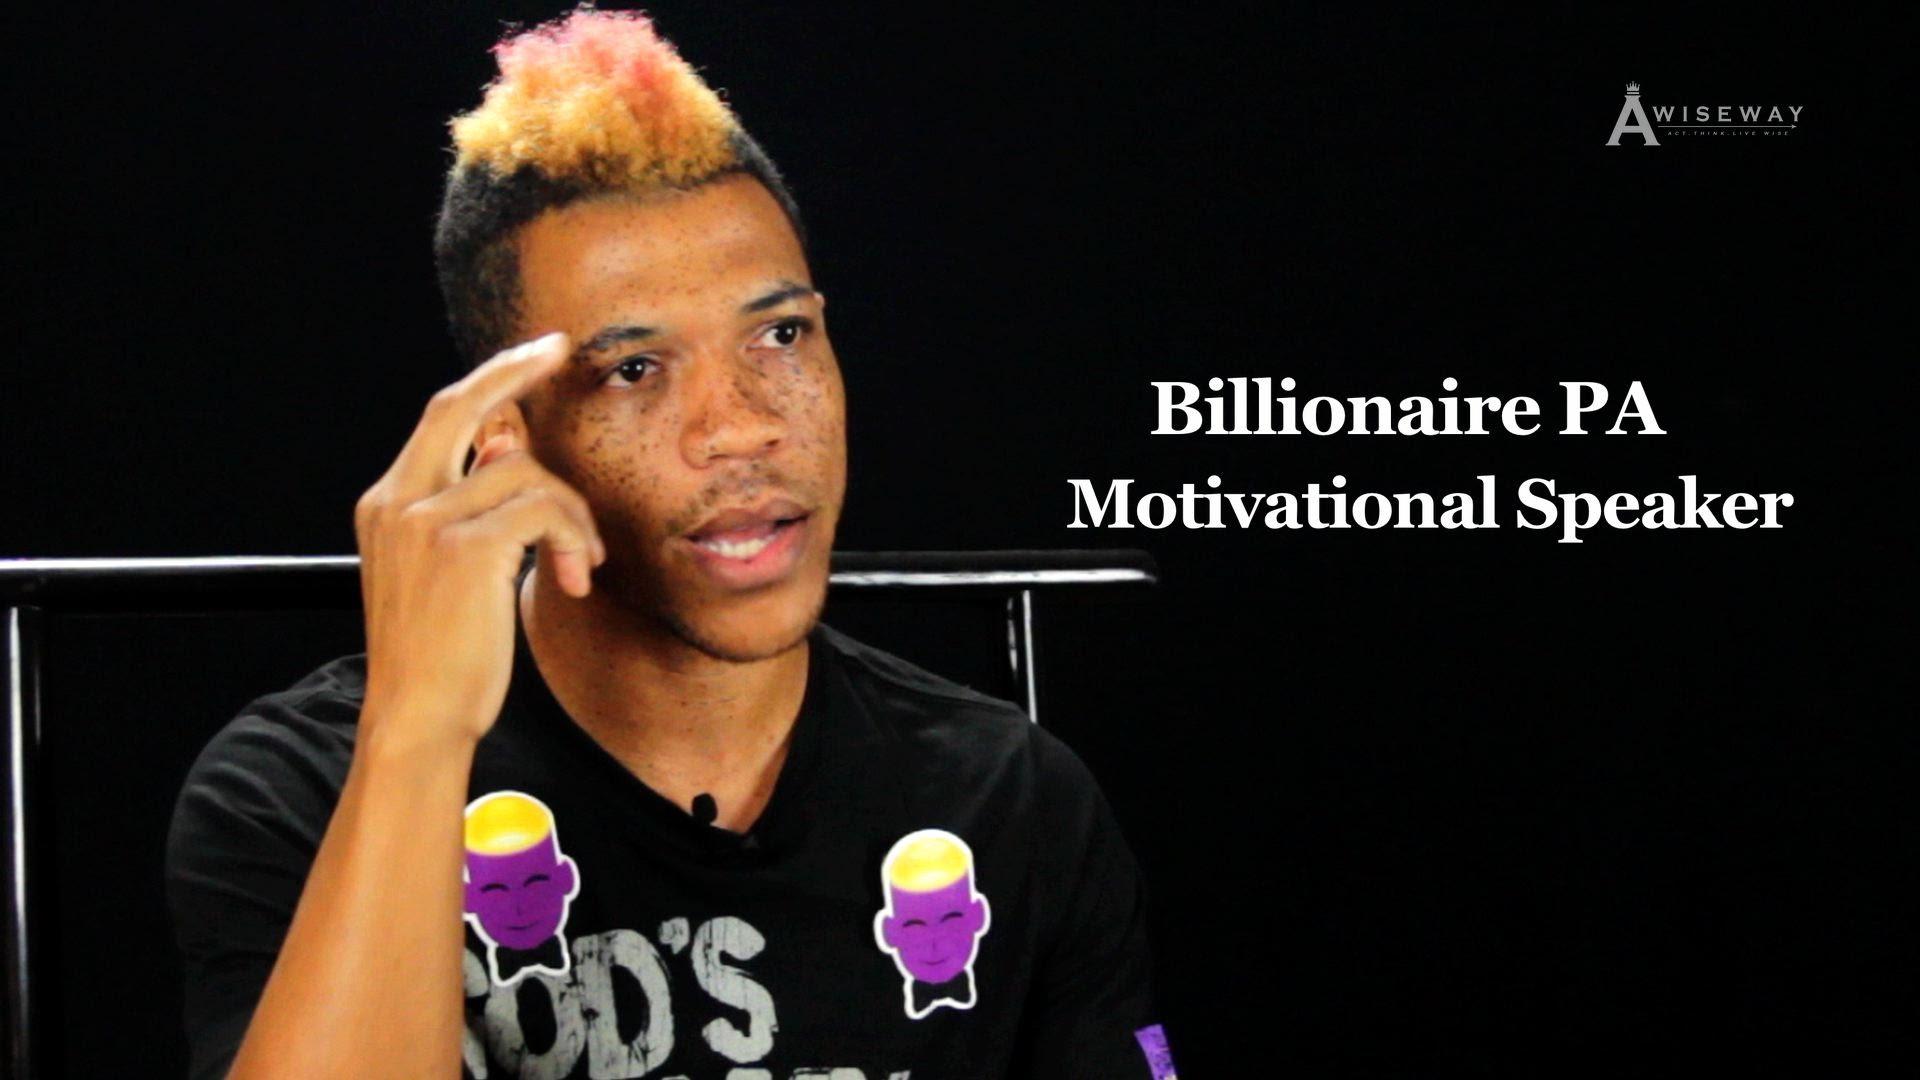 Motivational Speaker Shares The Reason He Regrets Selling Drugs